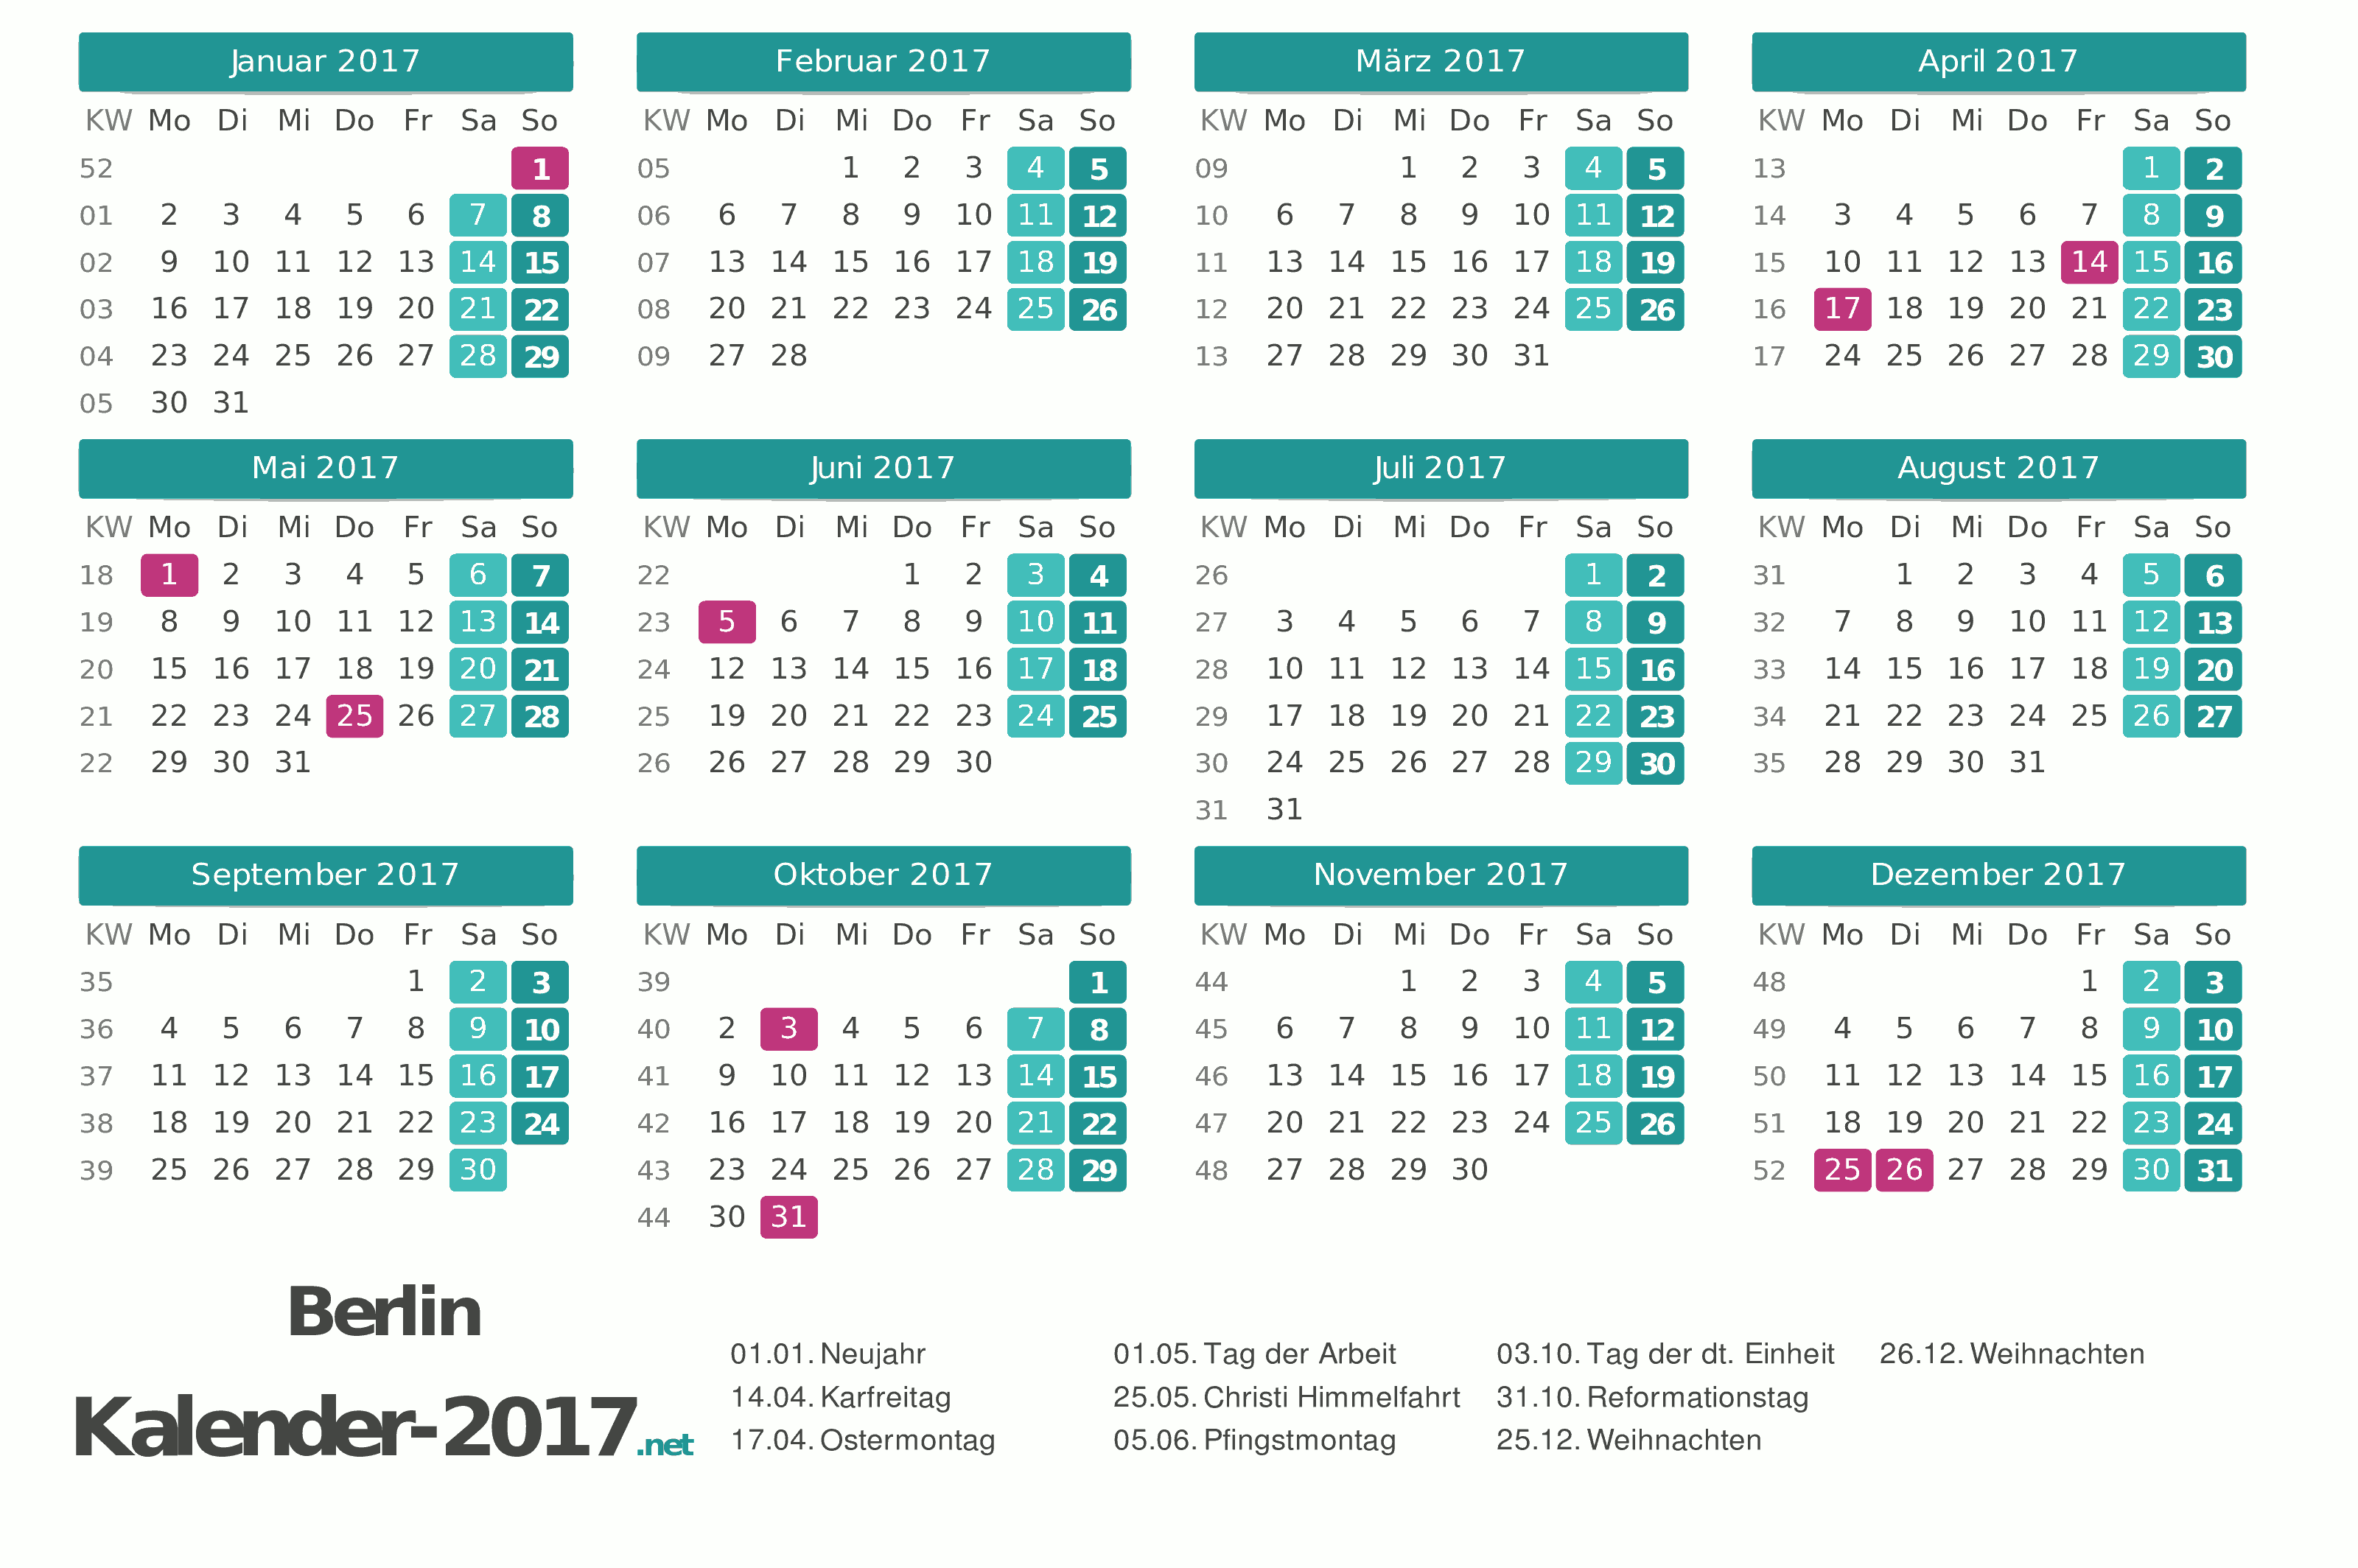 Berlin Kalender 2017 +